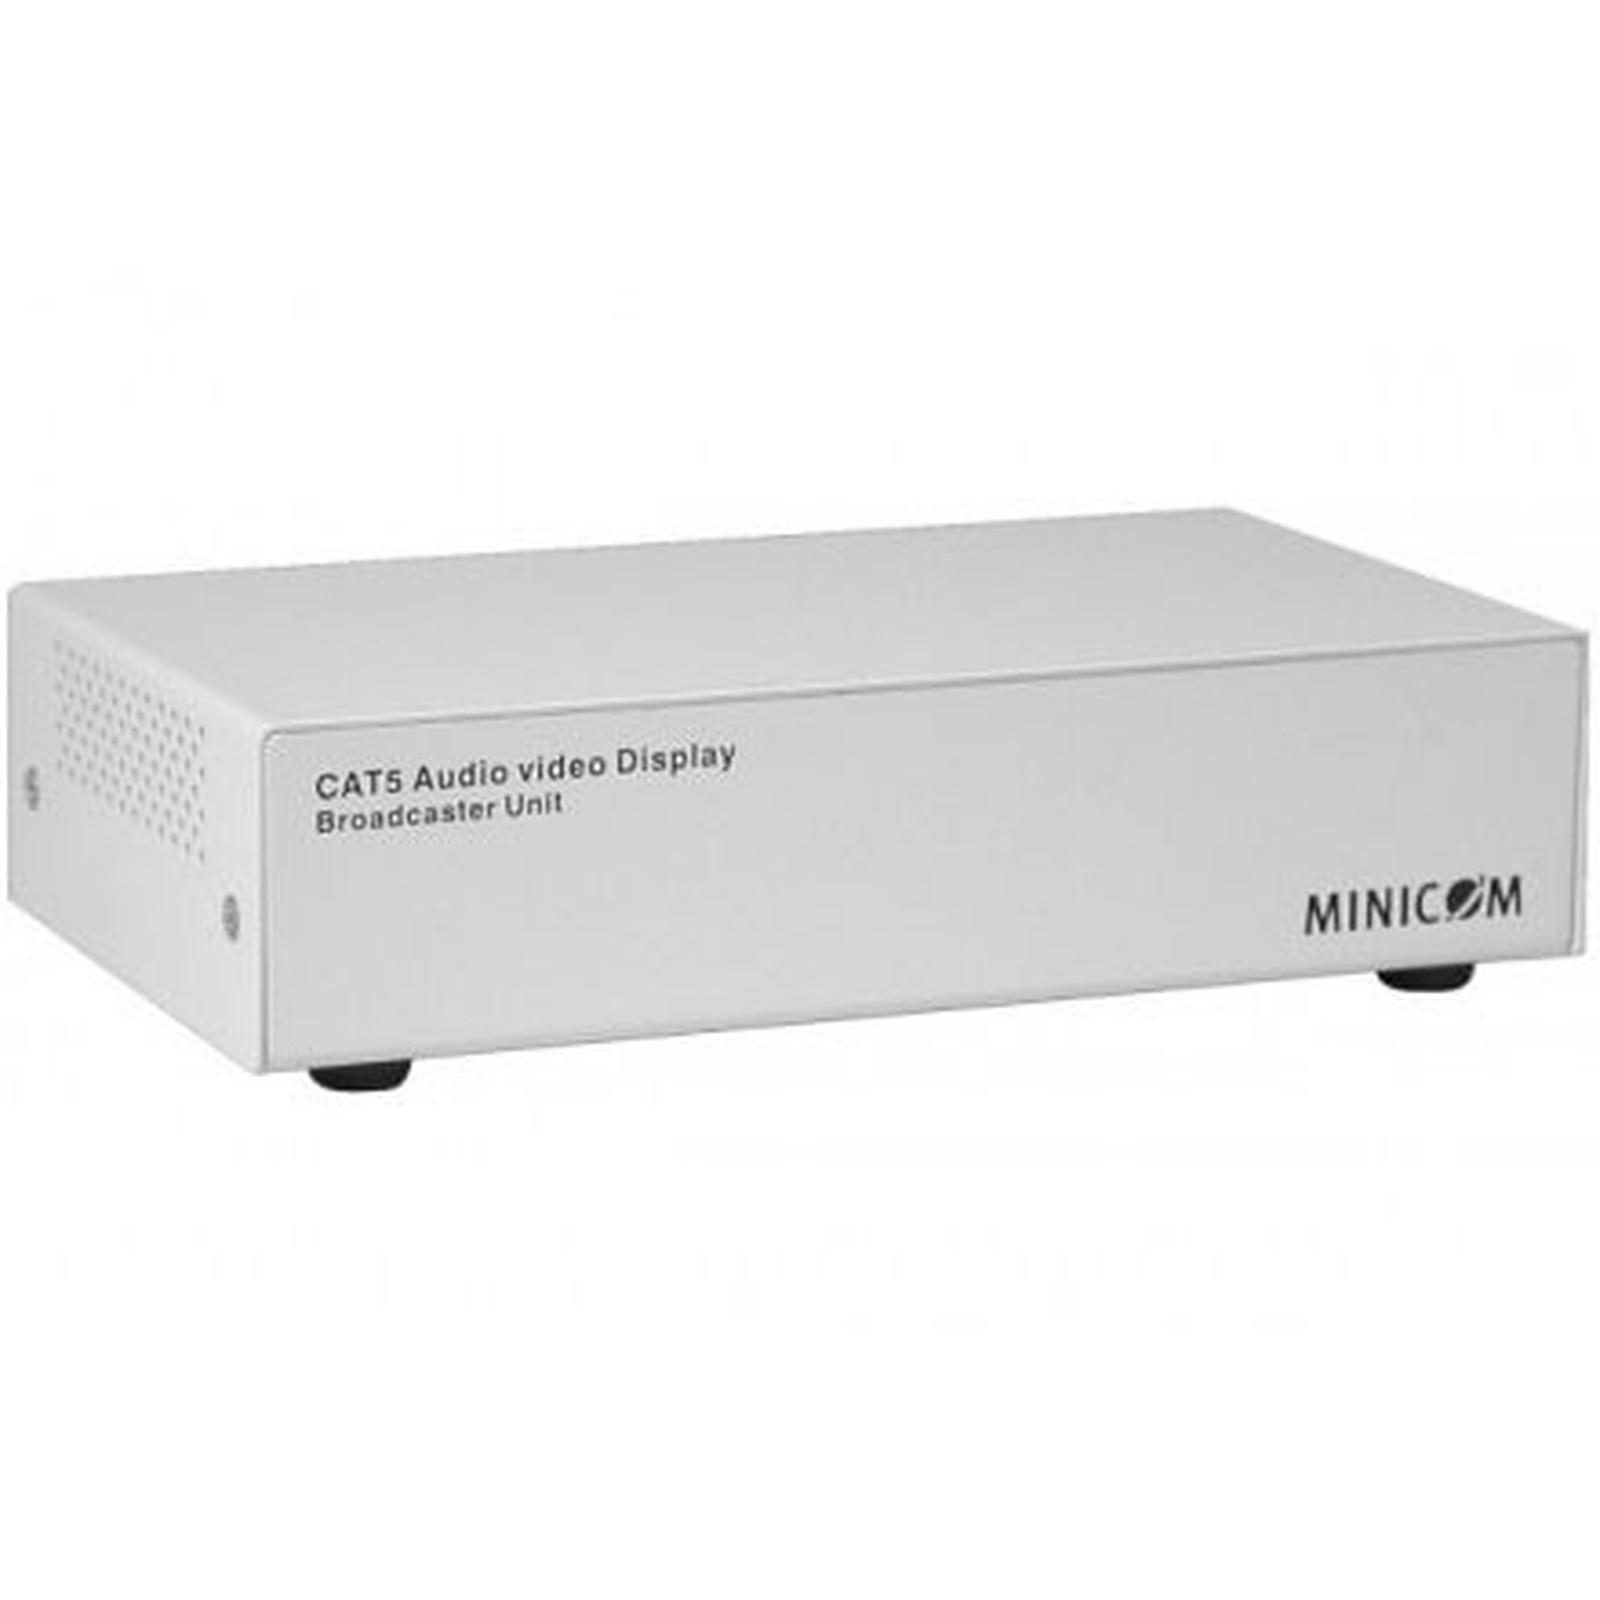 Minicom AVDS Broadcaster 8 Ports